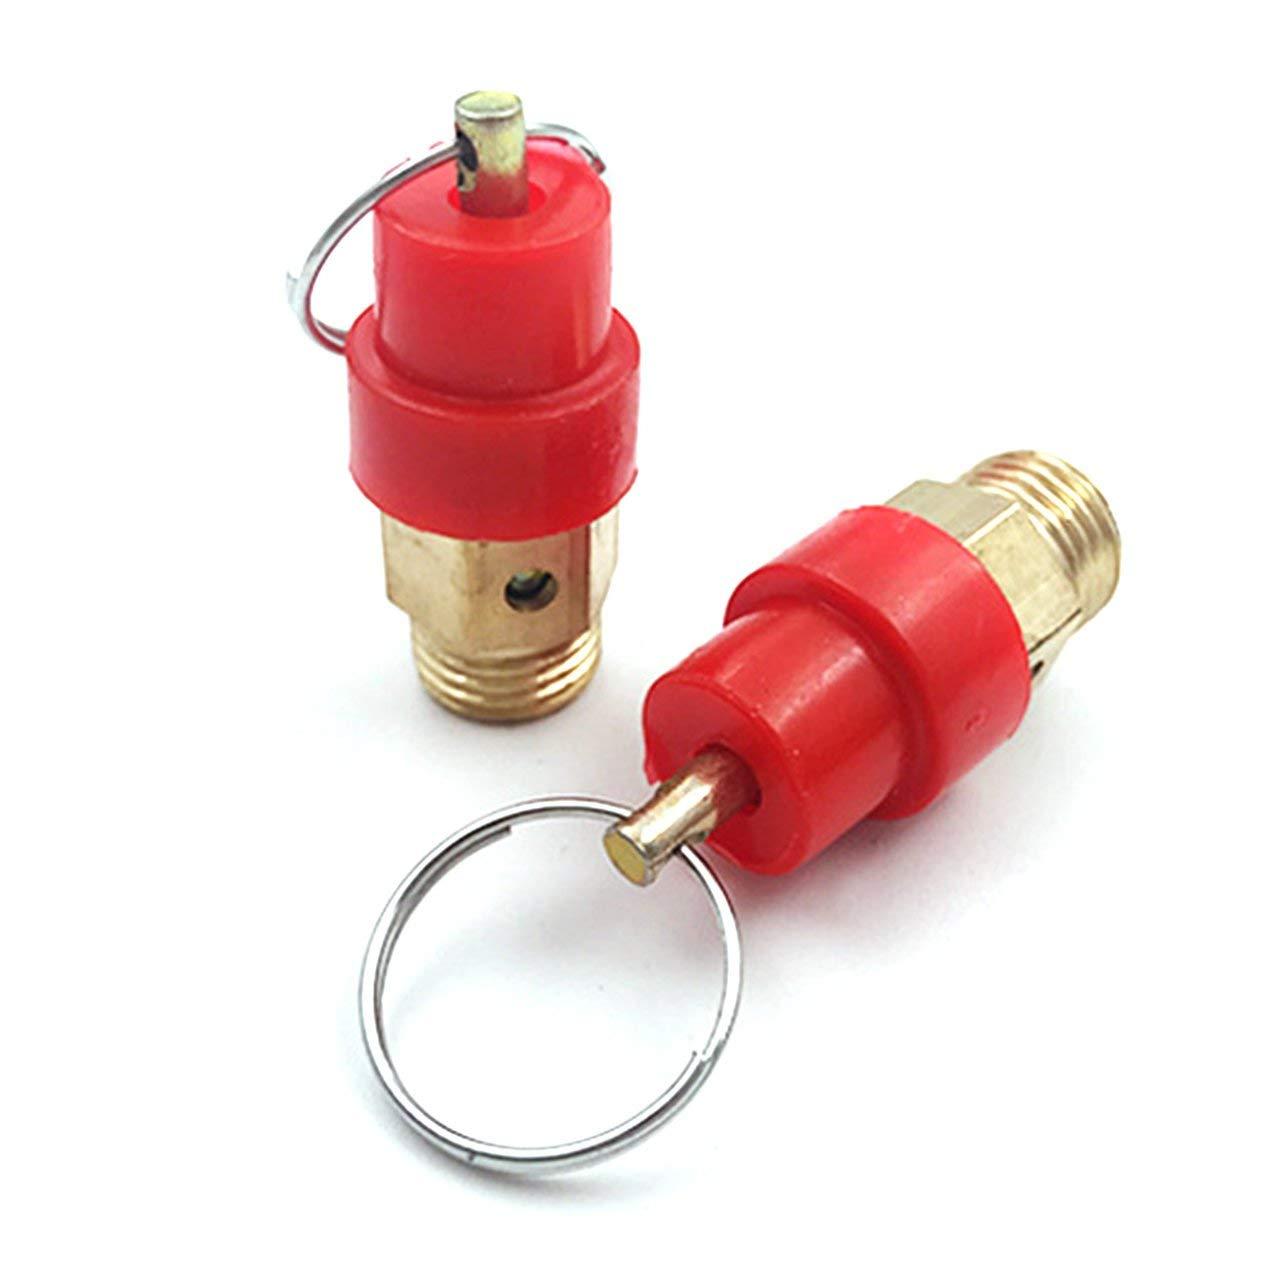 Heaviesk 1//4 8 KG Compresor de Aire V/álvula de liberaci/ón de Seguridad Regulador de Alivio de presi/ón V/álvula de Escape para m/áquina de Espuma M/áquina de Suministro de Agua